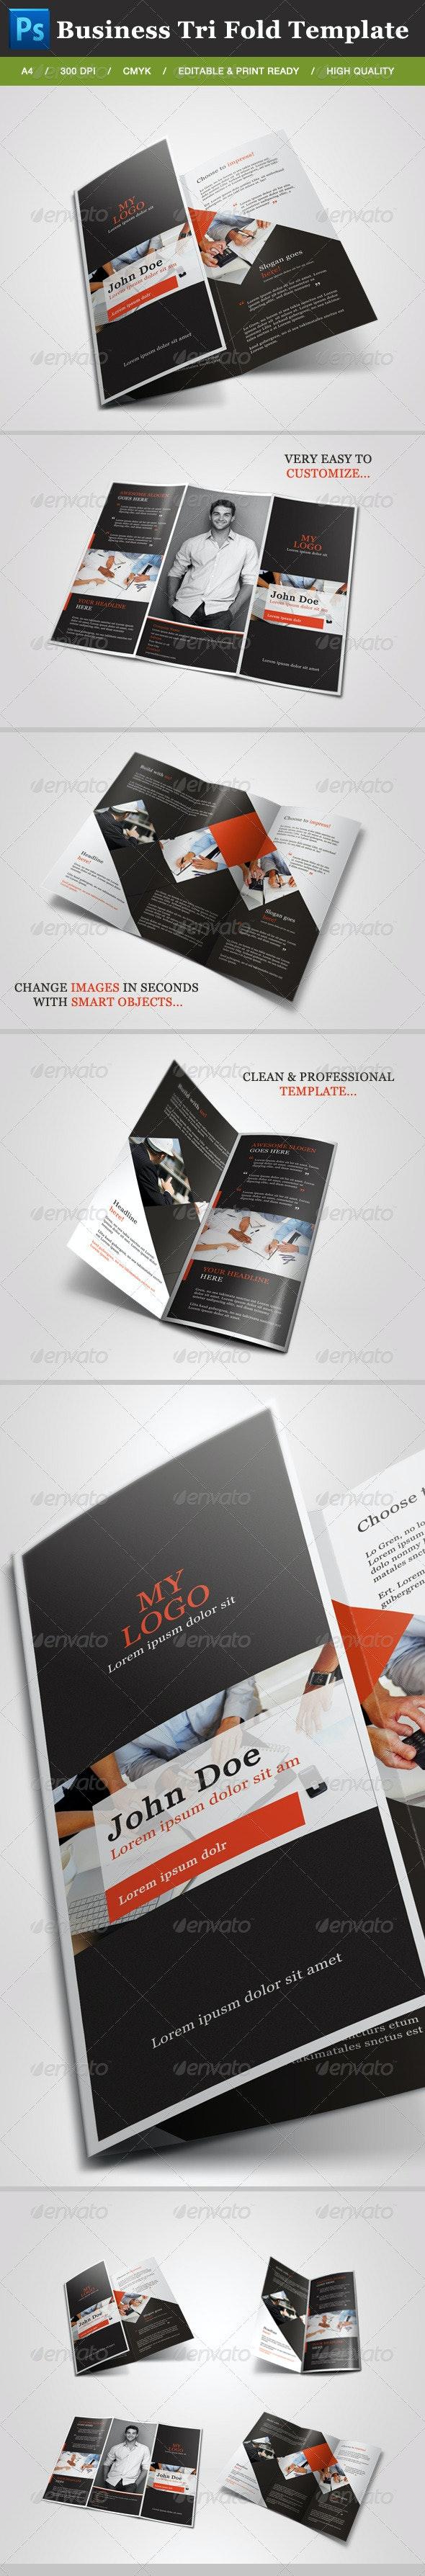 Business Tri Fold Brochure - Brochures Print Templates